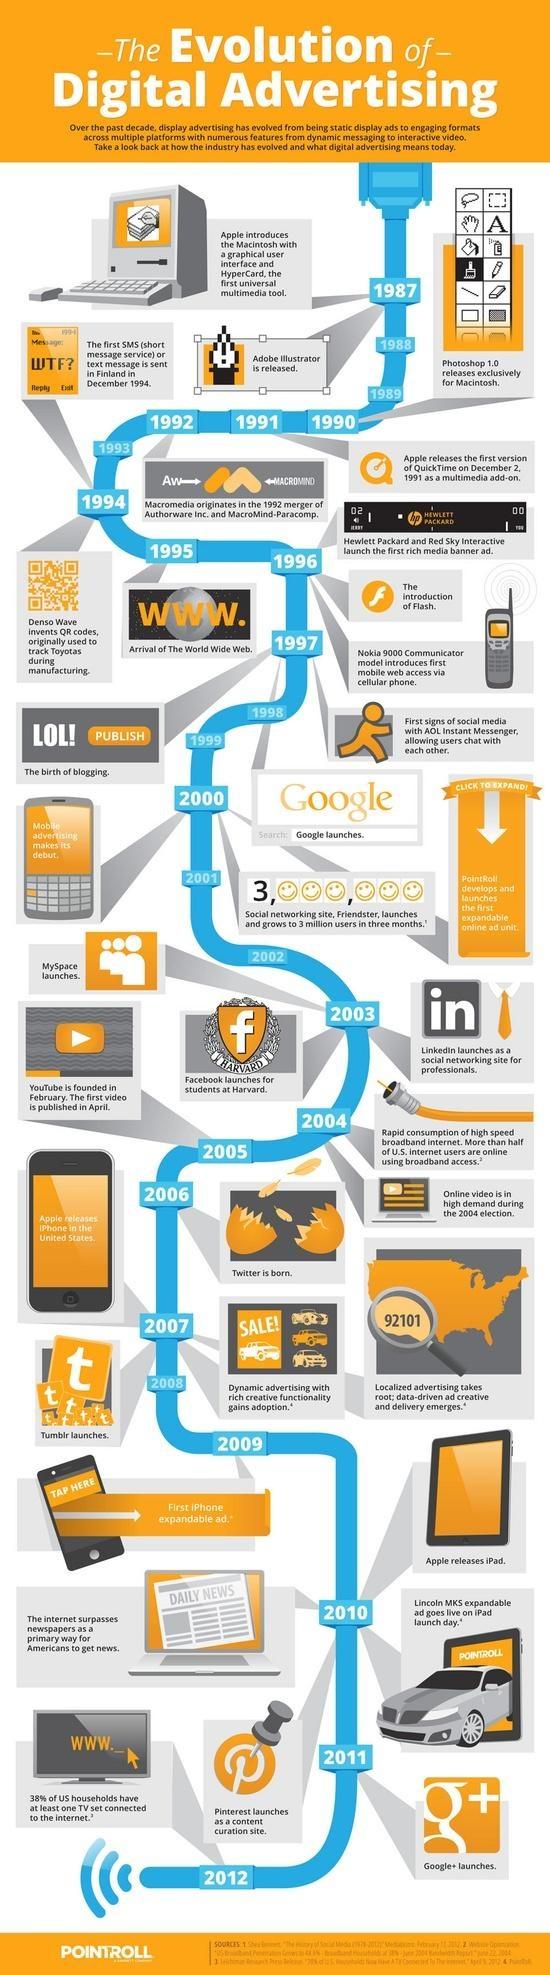 The Evolution of Digital Advertising